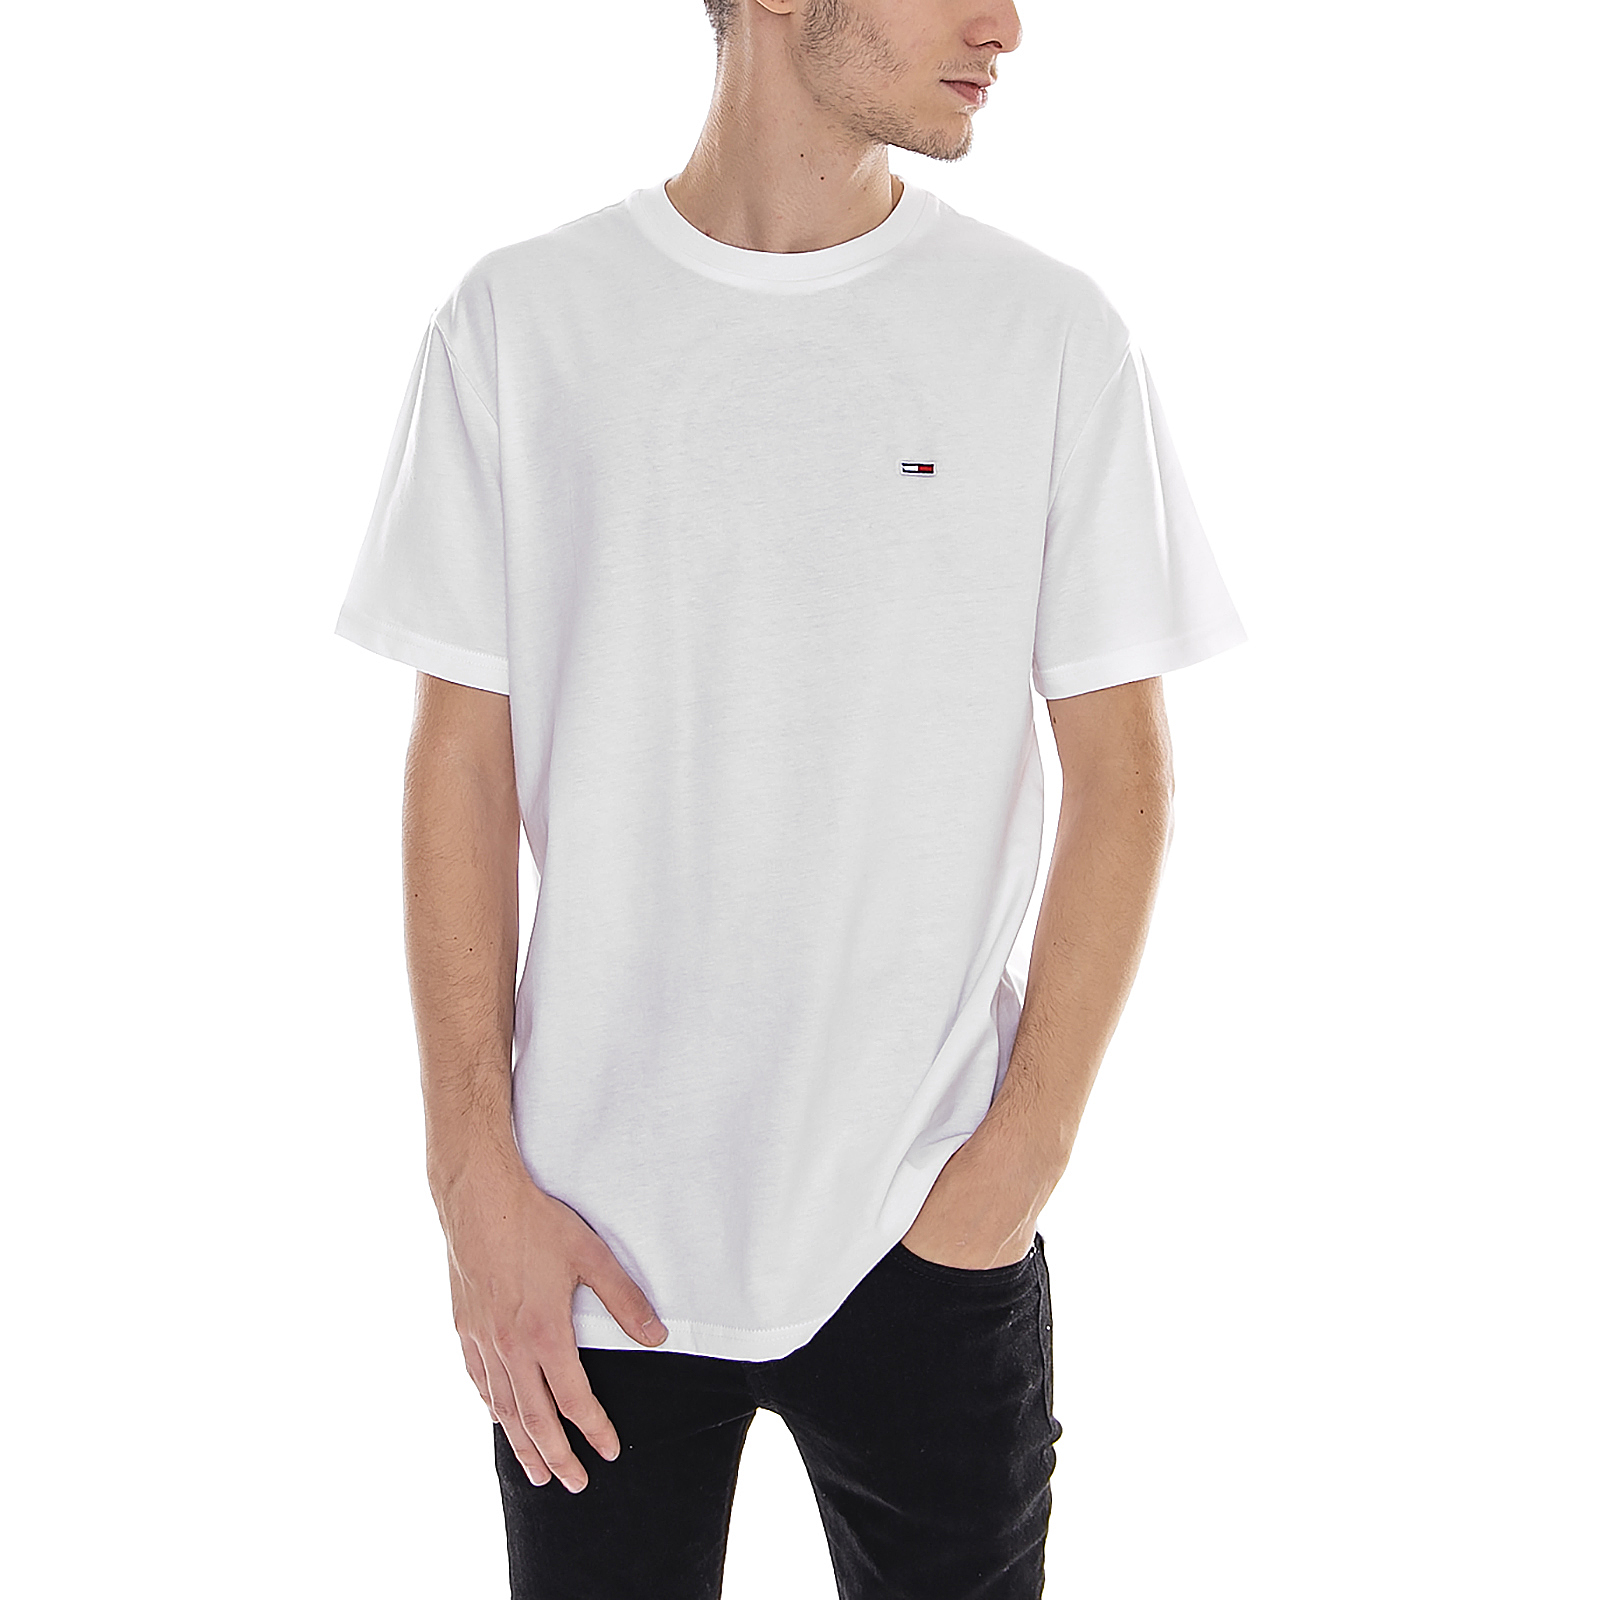 6d01ed74 Tommy Hilfiger T-Shirt Tjm Tommy Classics Tee Classic White White   eBay